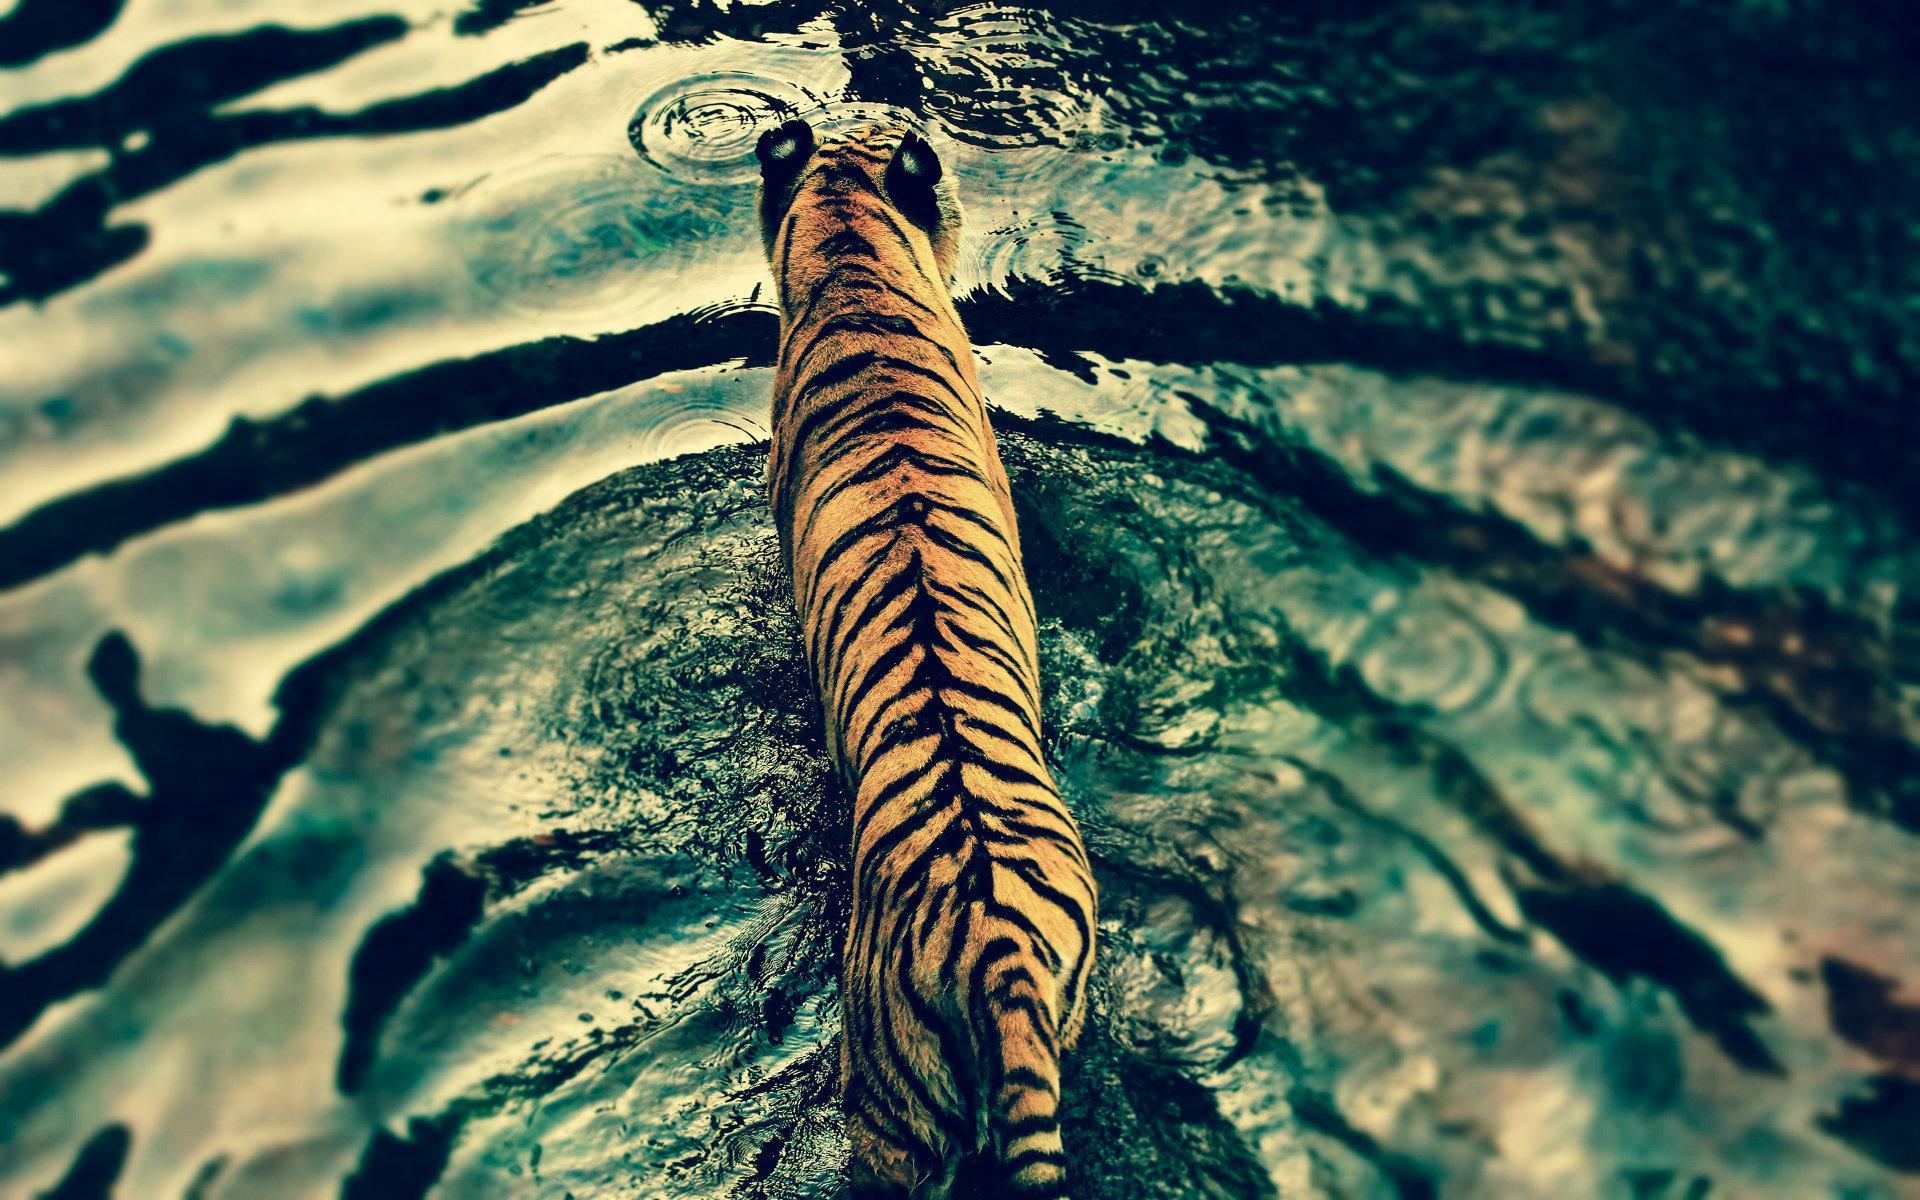 Black Tiger Wallpapers Hd Download Black Tiger Wallpapers Hd Tiger